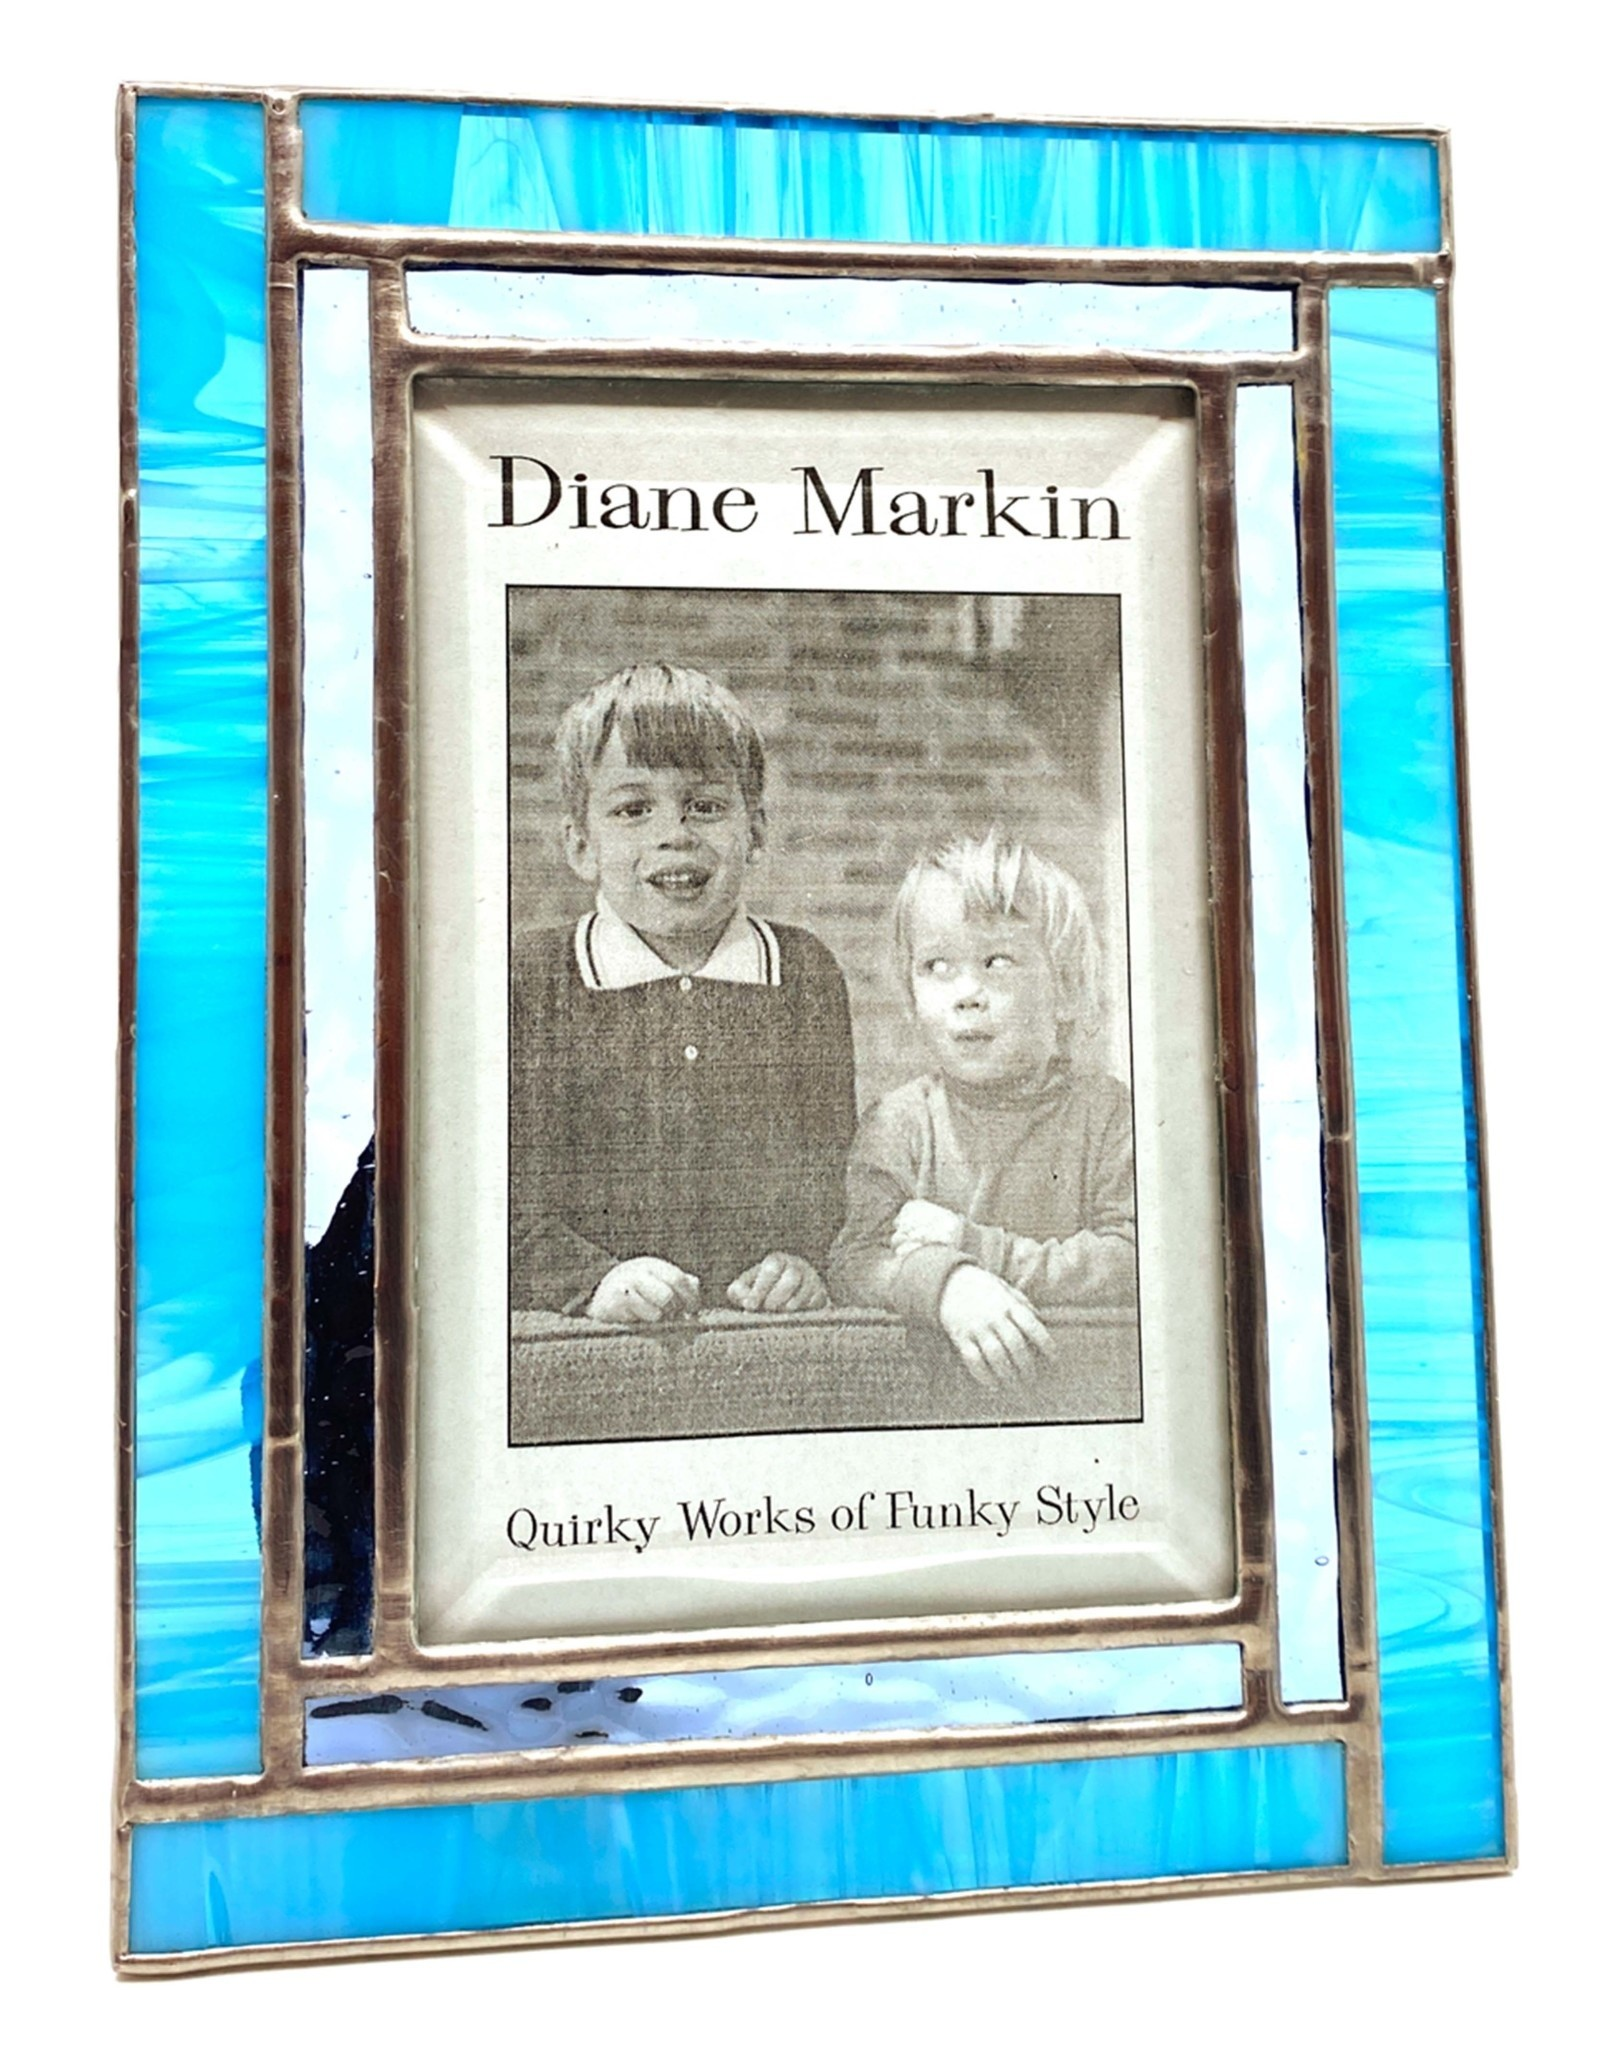 DIANE MARKIN 4X6 WISPY WINDOW BLUE PICTURE FRAME